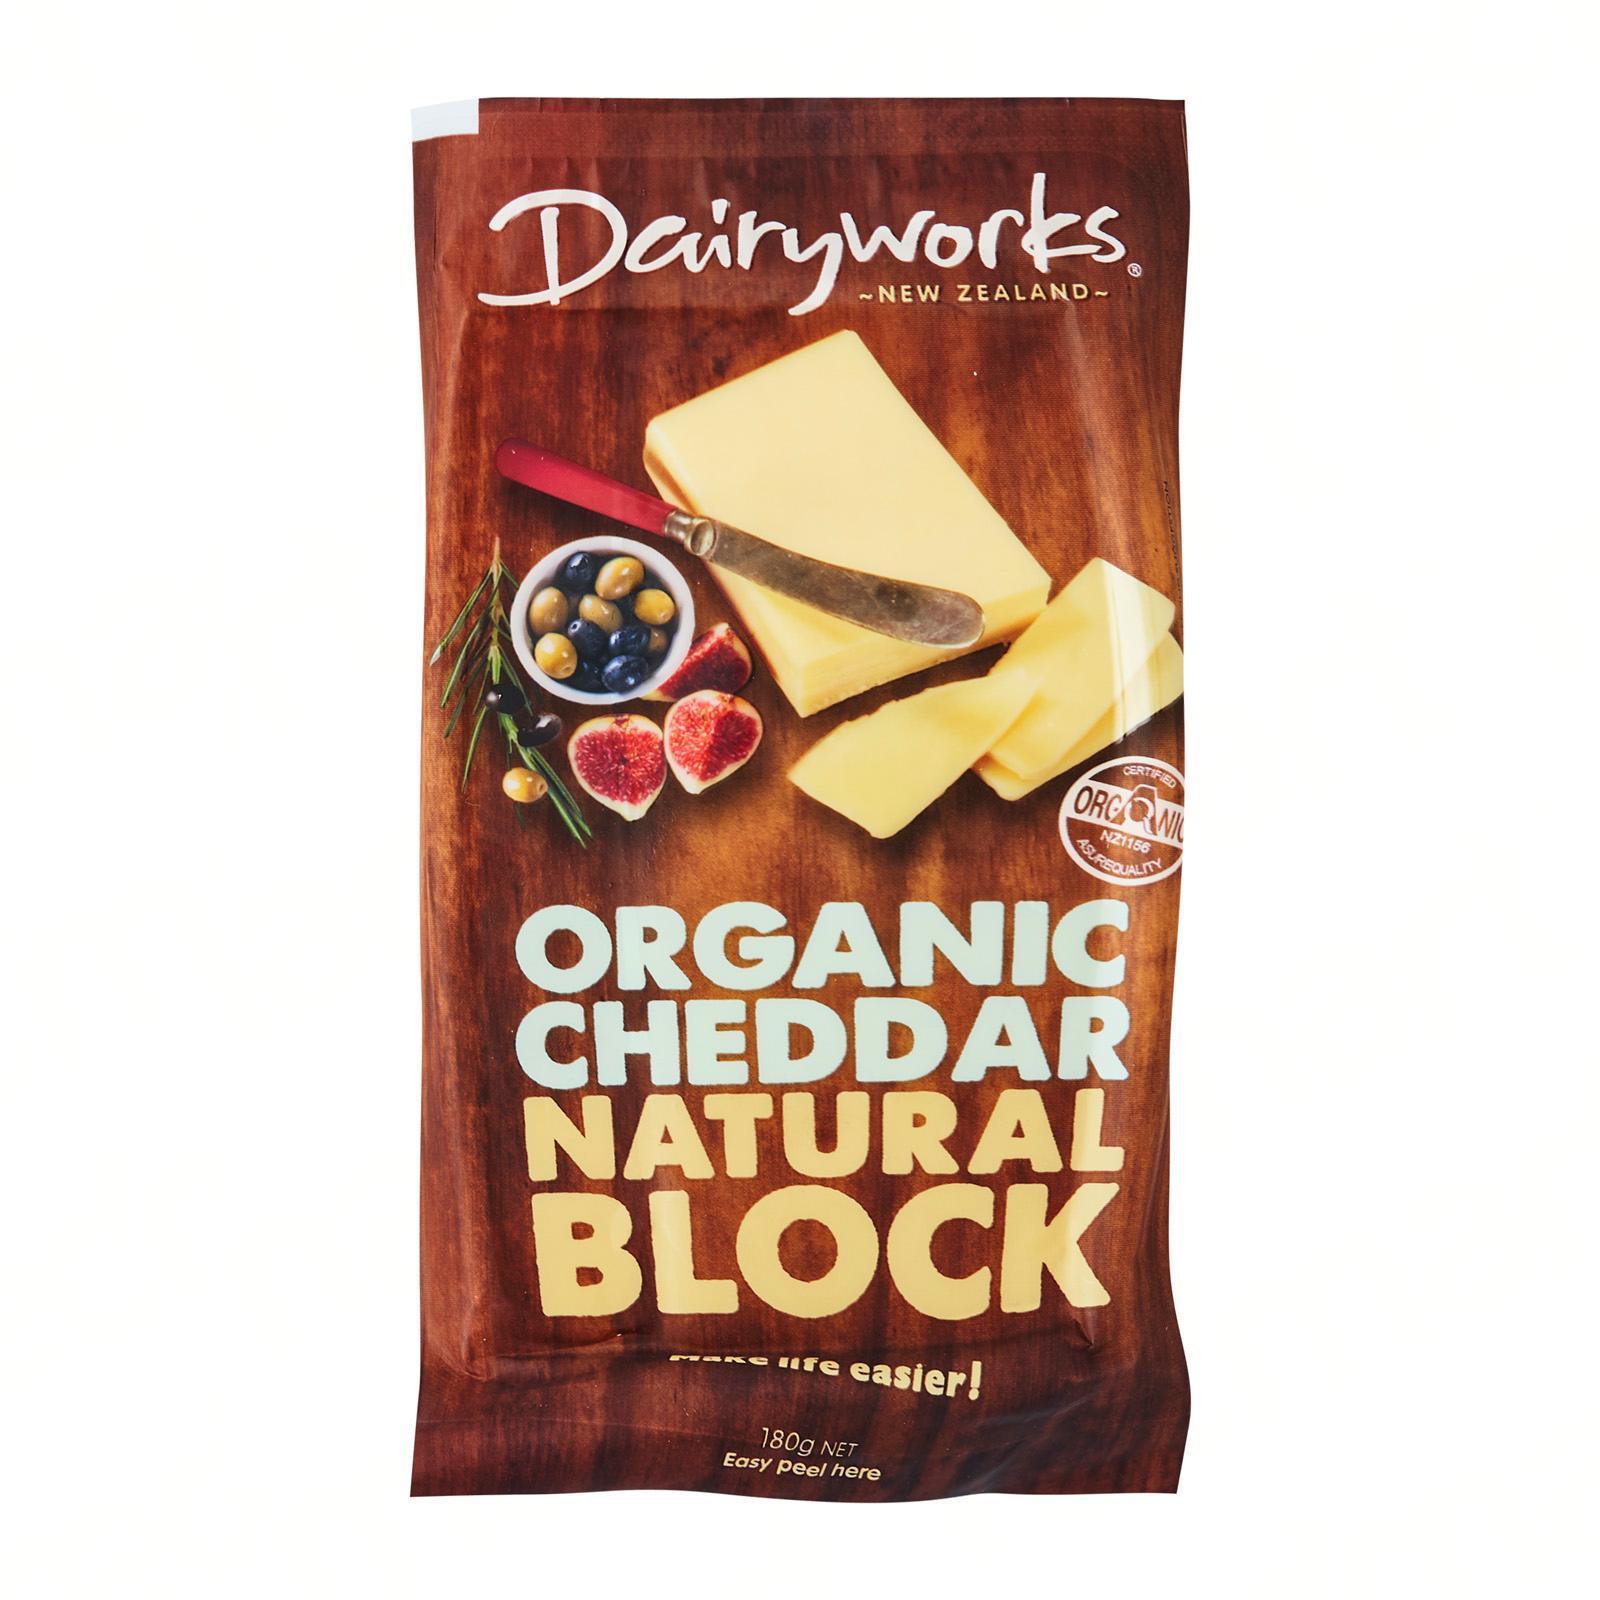 Dairyworks Organic Cheddar Natural Block Cheese